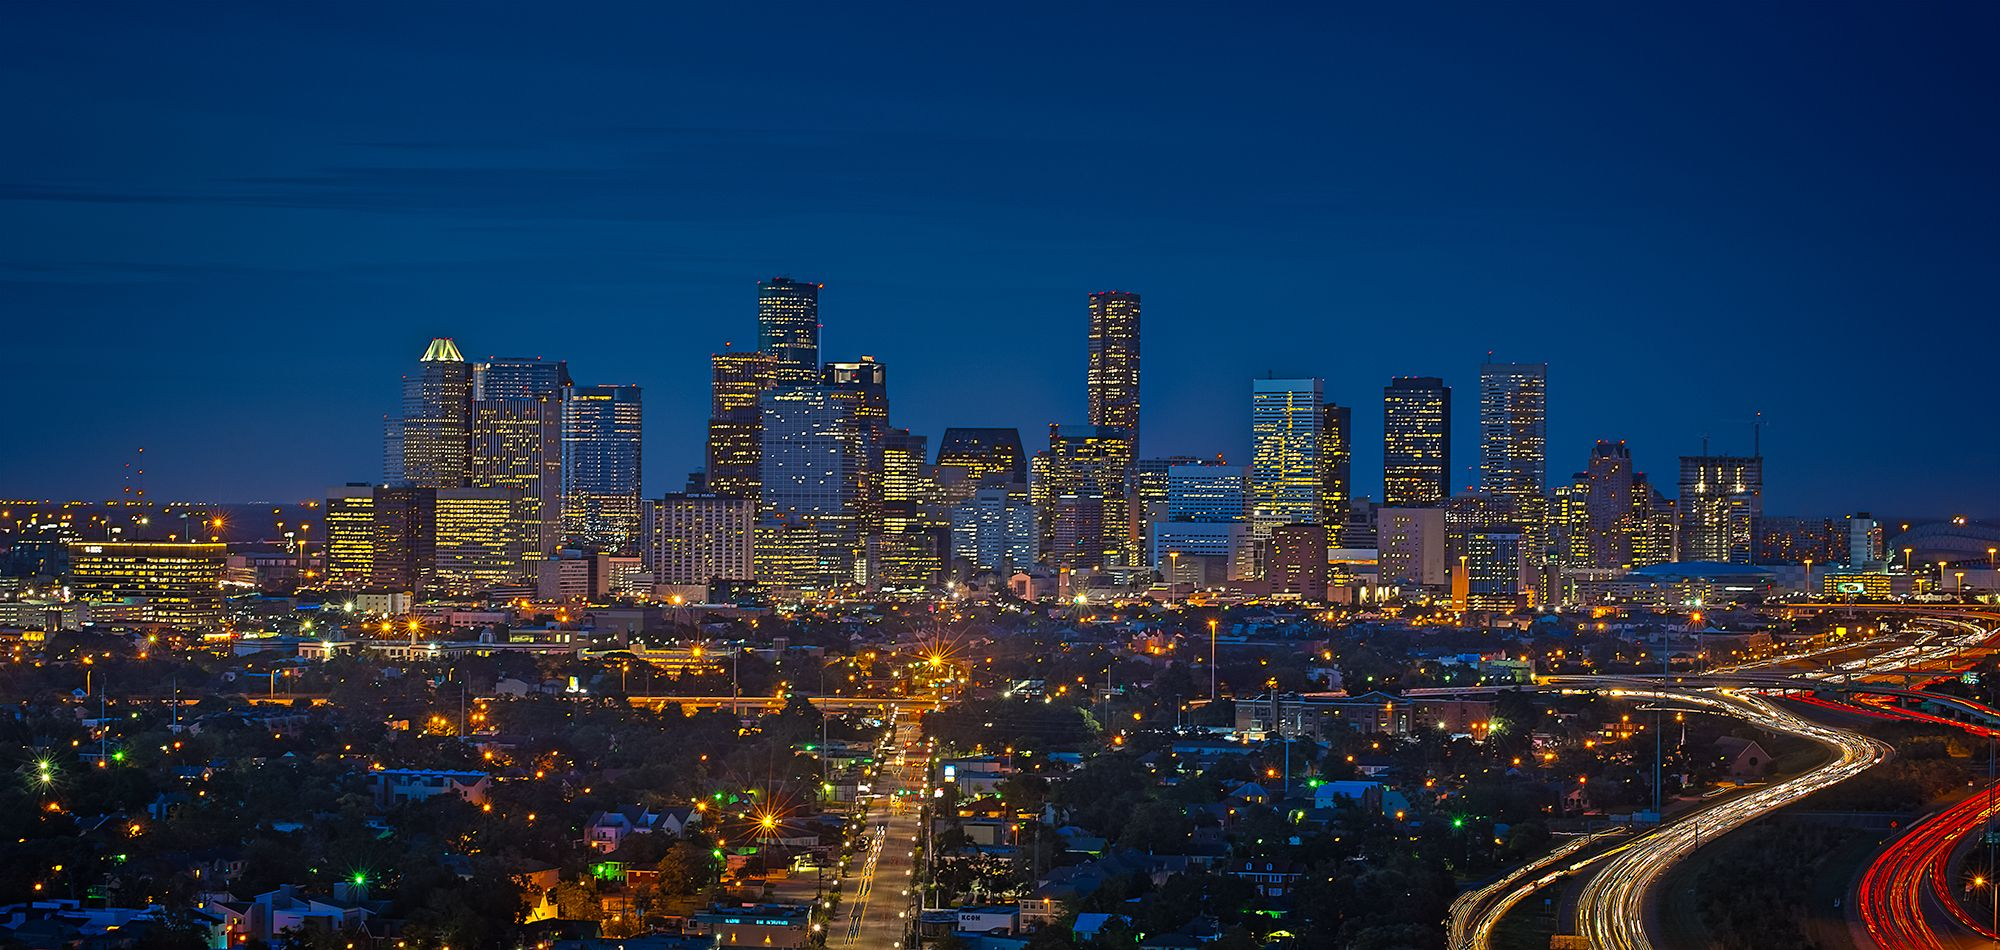 Houston Night Skyline Houston skyline, Night skyline